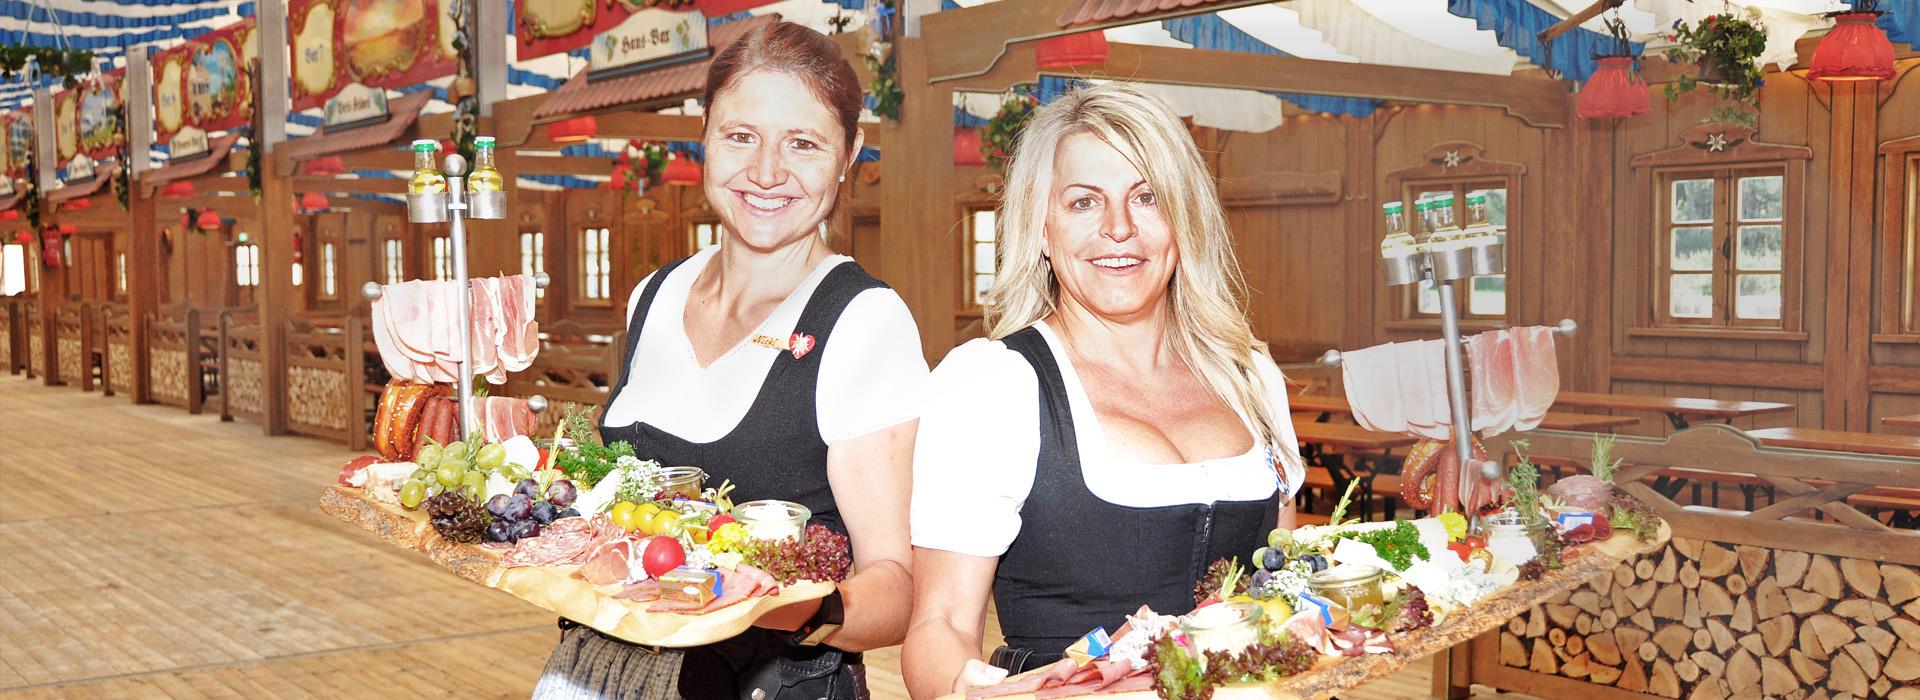 festhalle-bayernland-schoeniger_fruehlingsfest-muenchen_2019-e